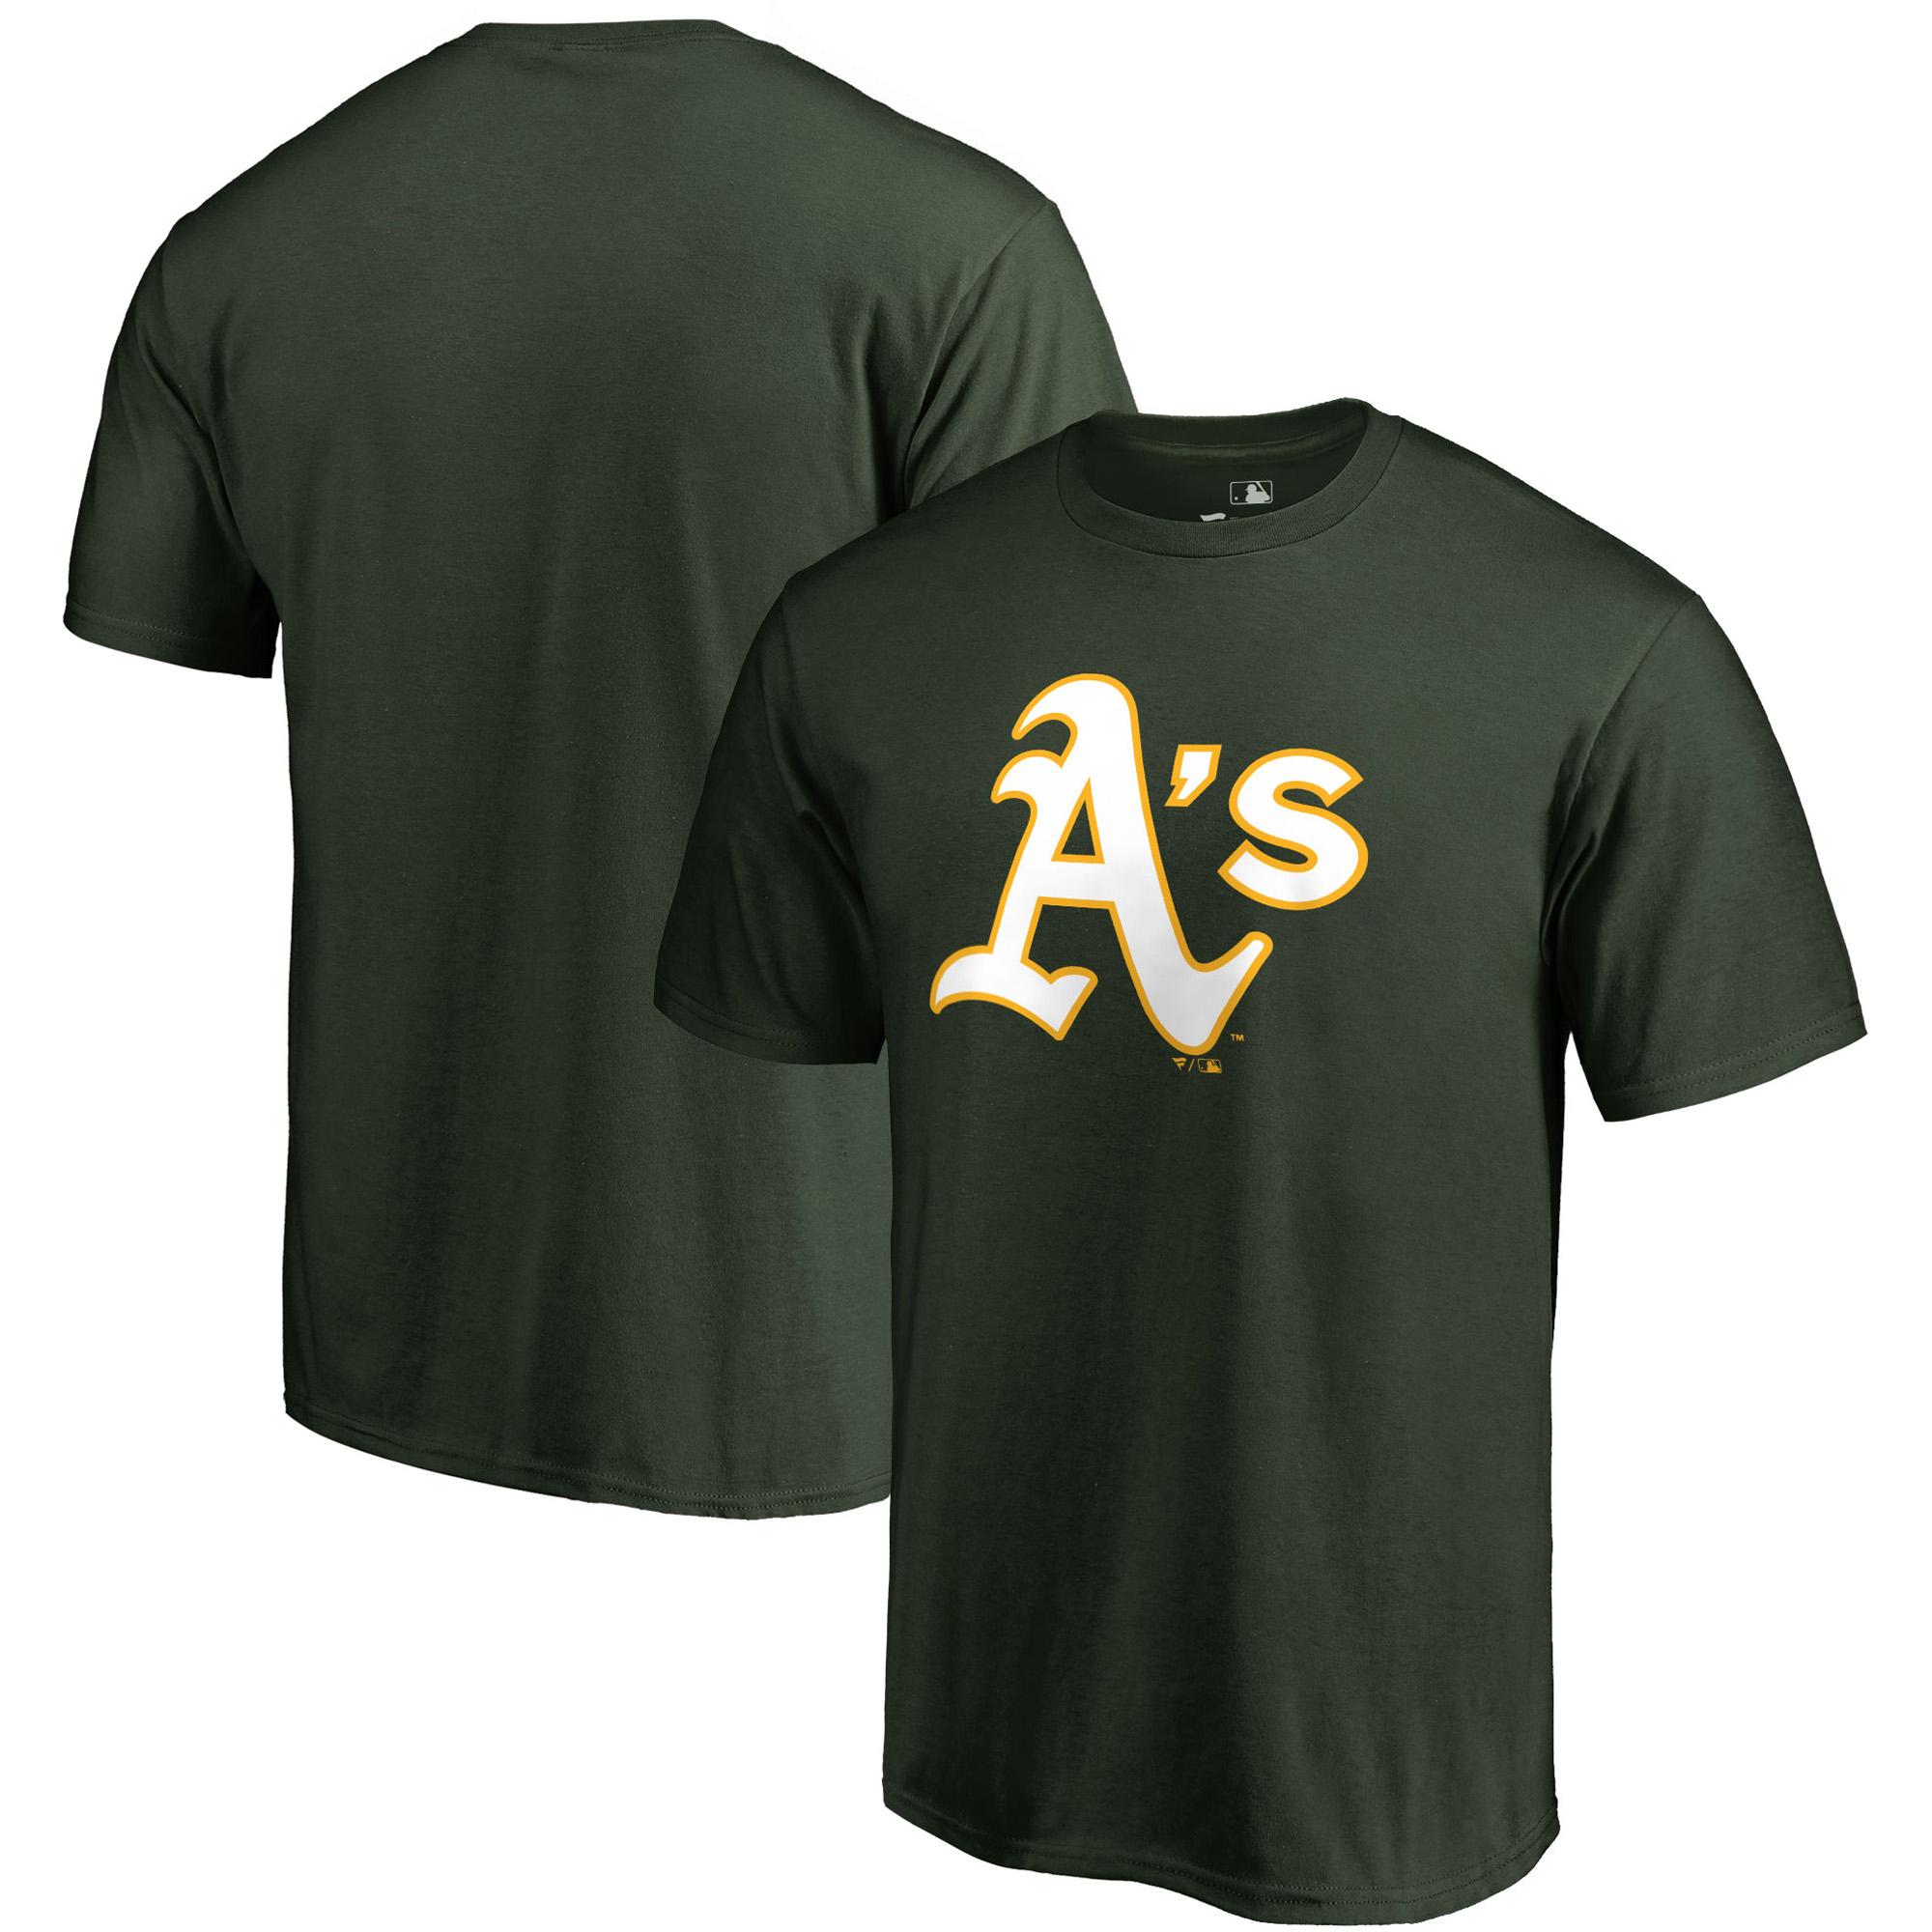 Oakland Athletics Fanatics Branded Primary Logo T-Shirt - Green